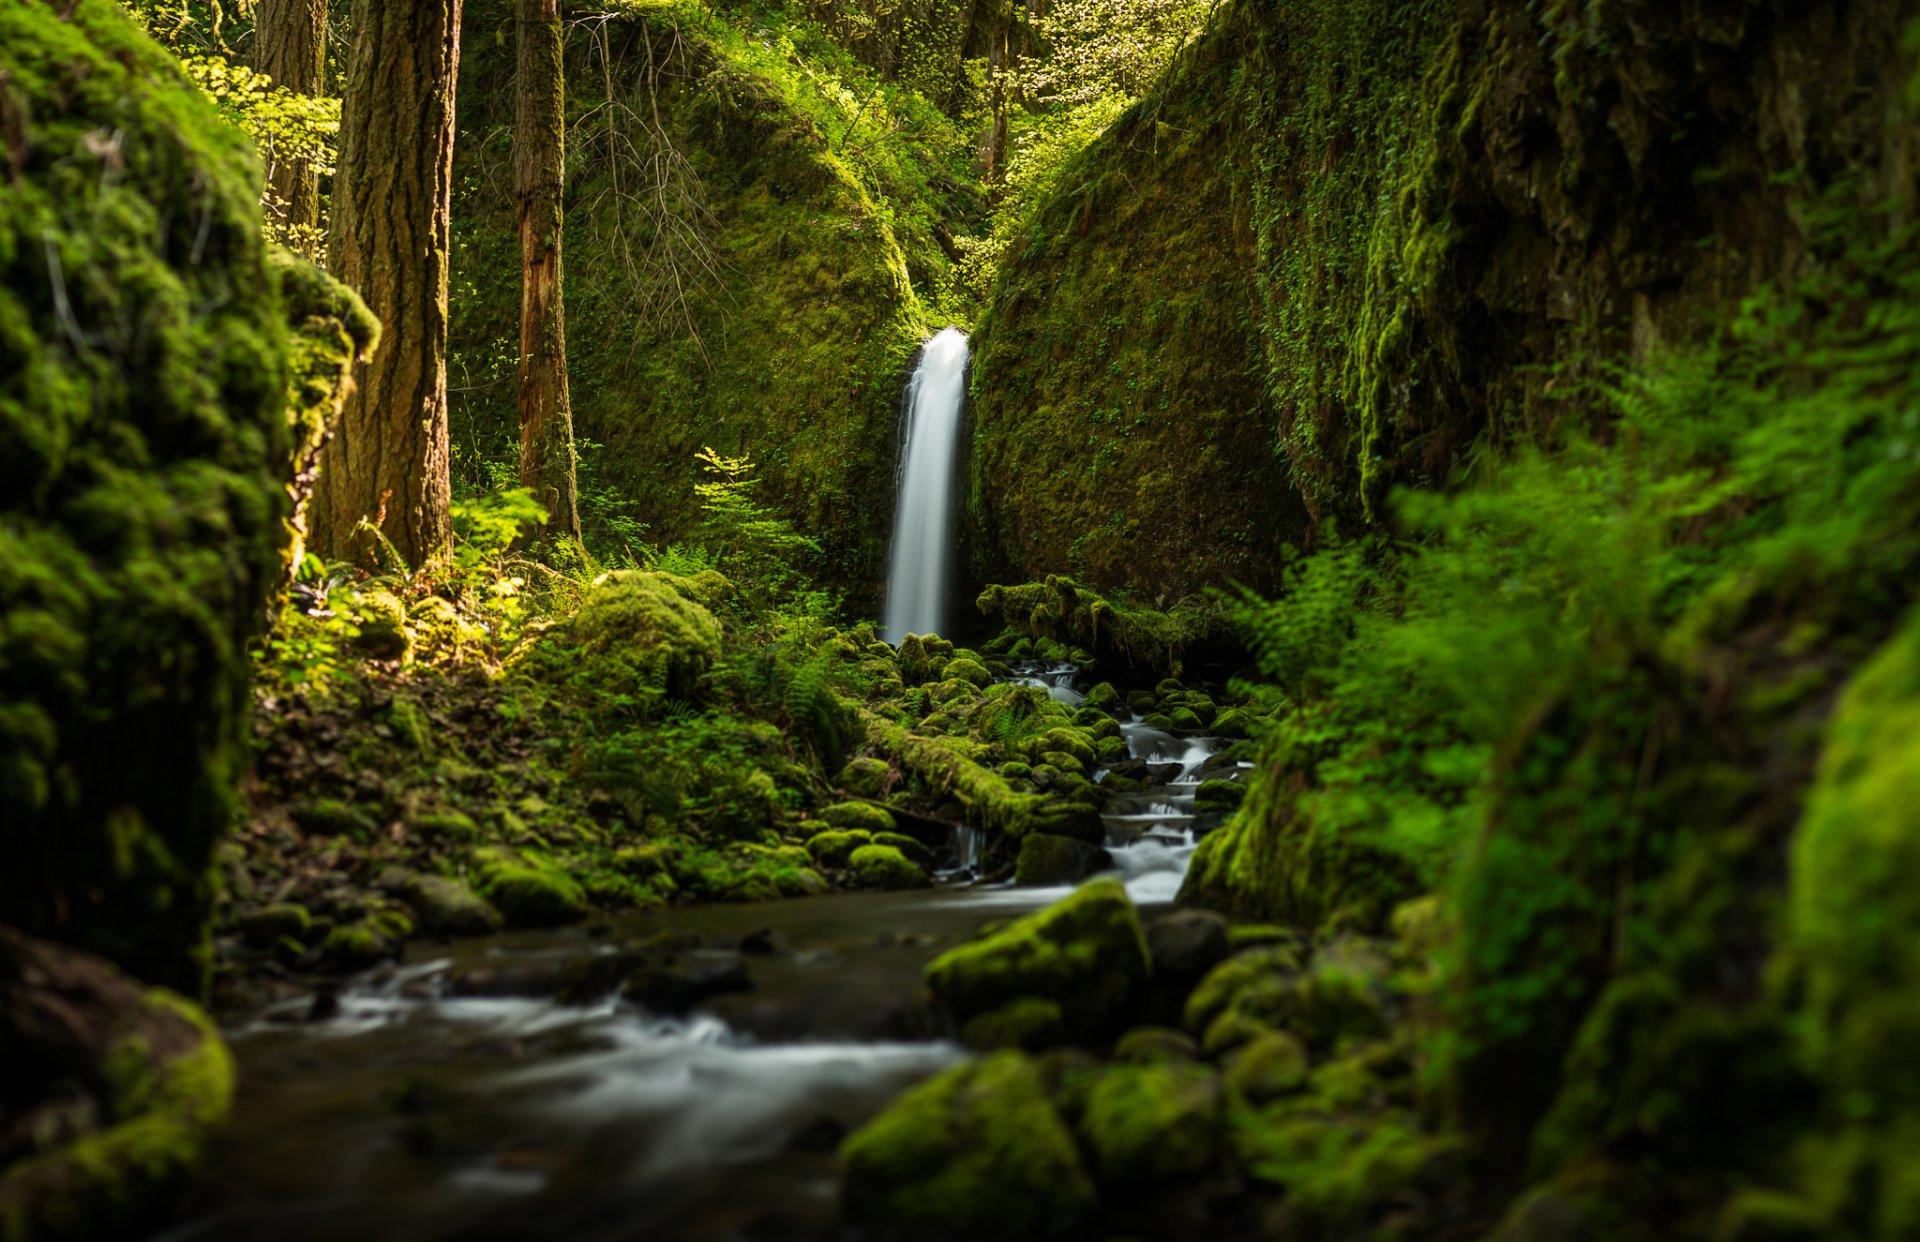 природа река водопад лес деревья nature river waterfall forest trees  № 484134 без смс